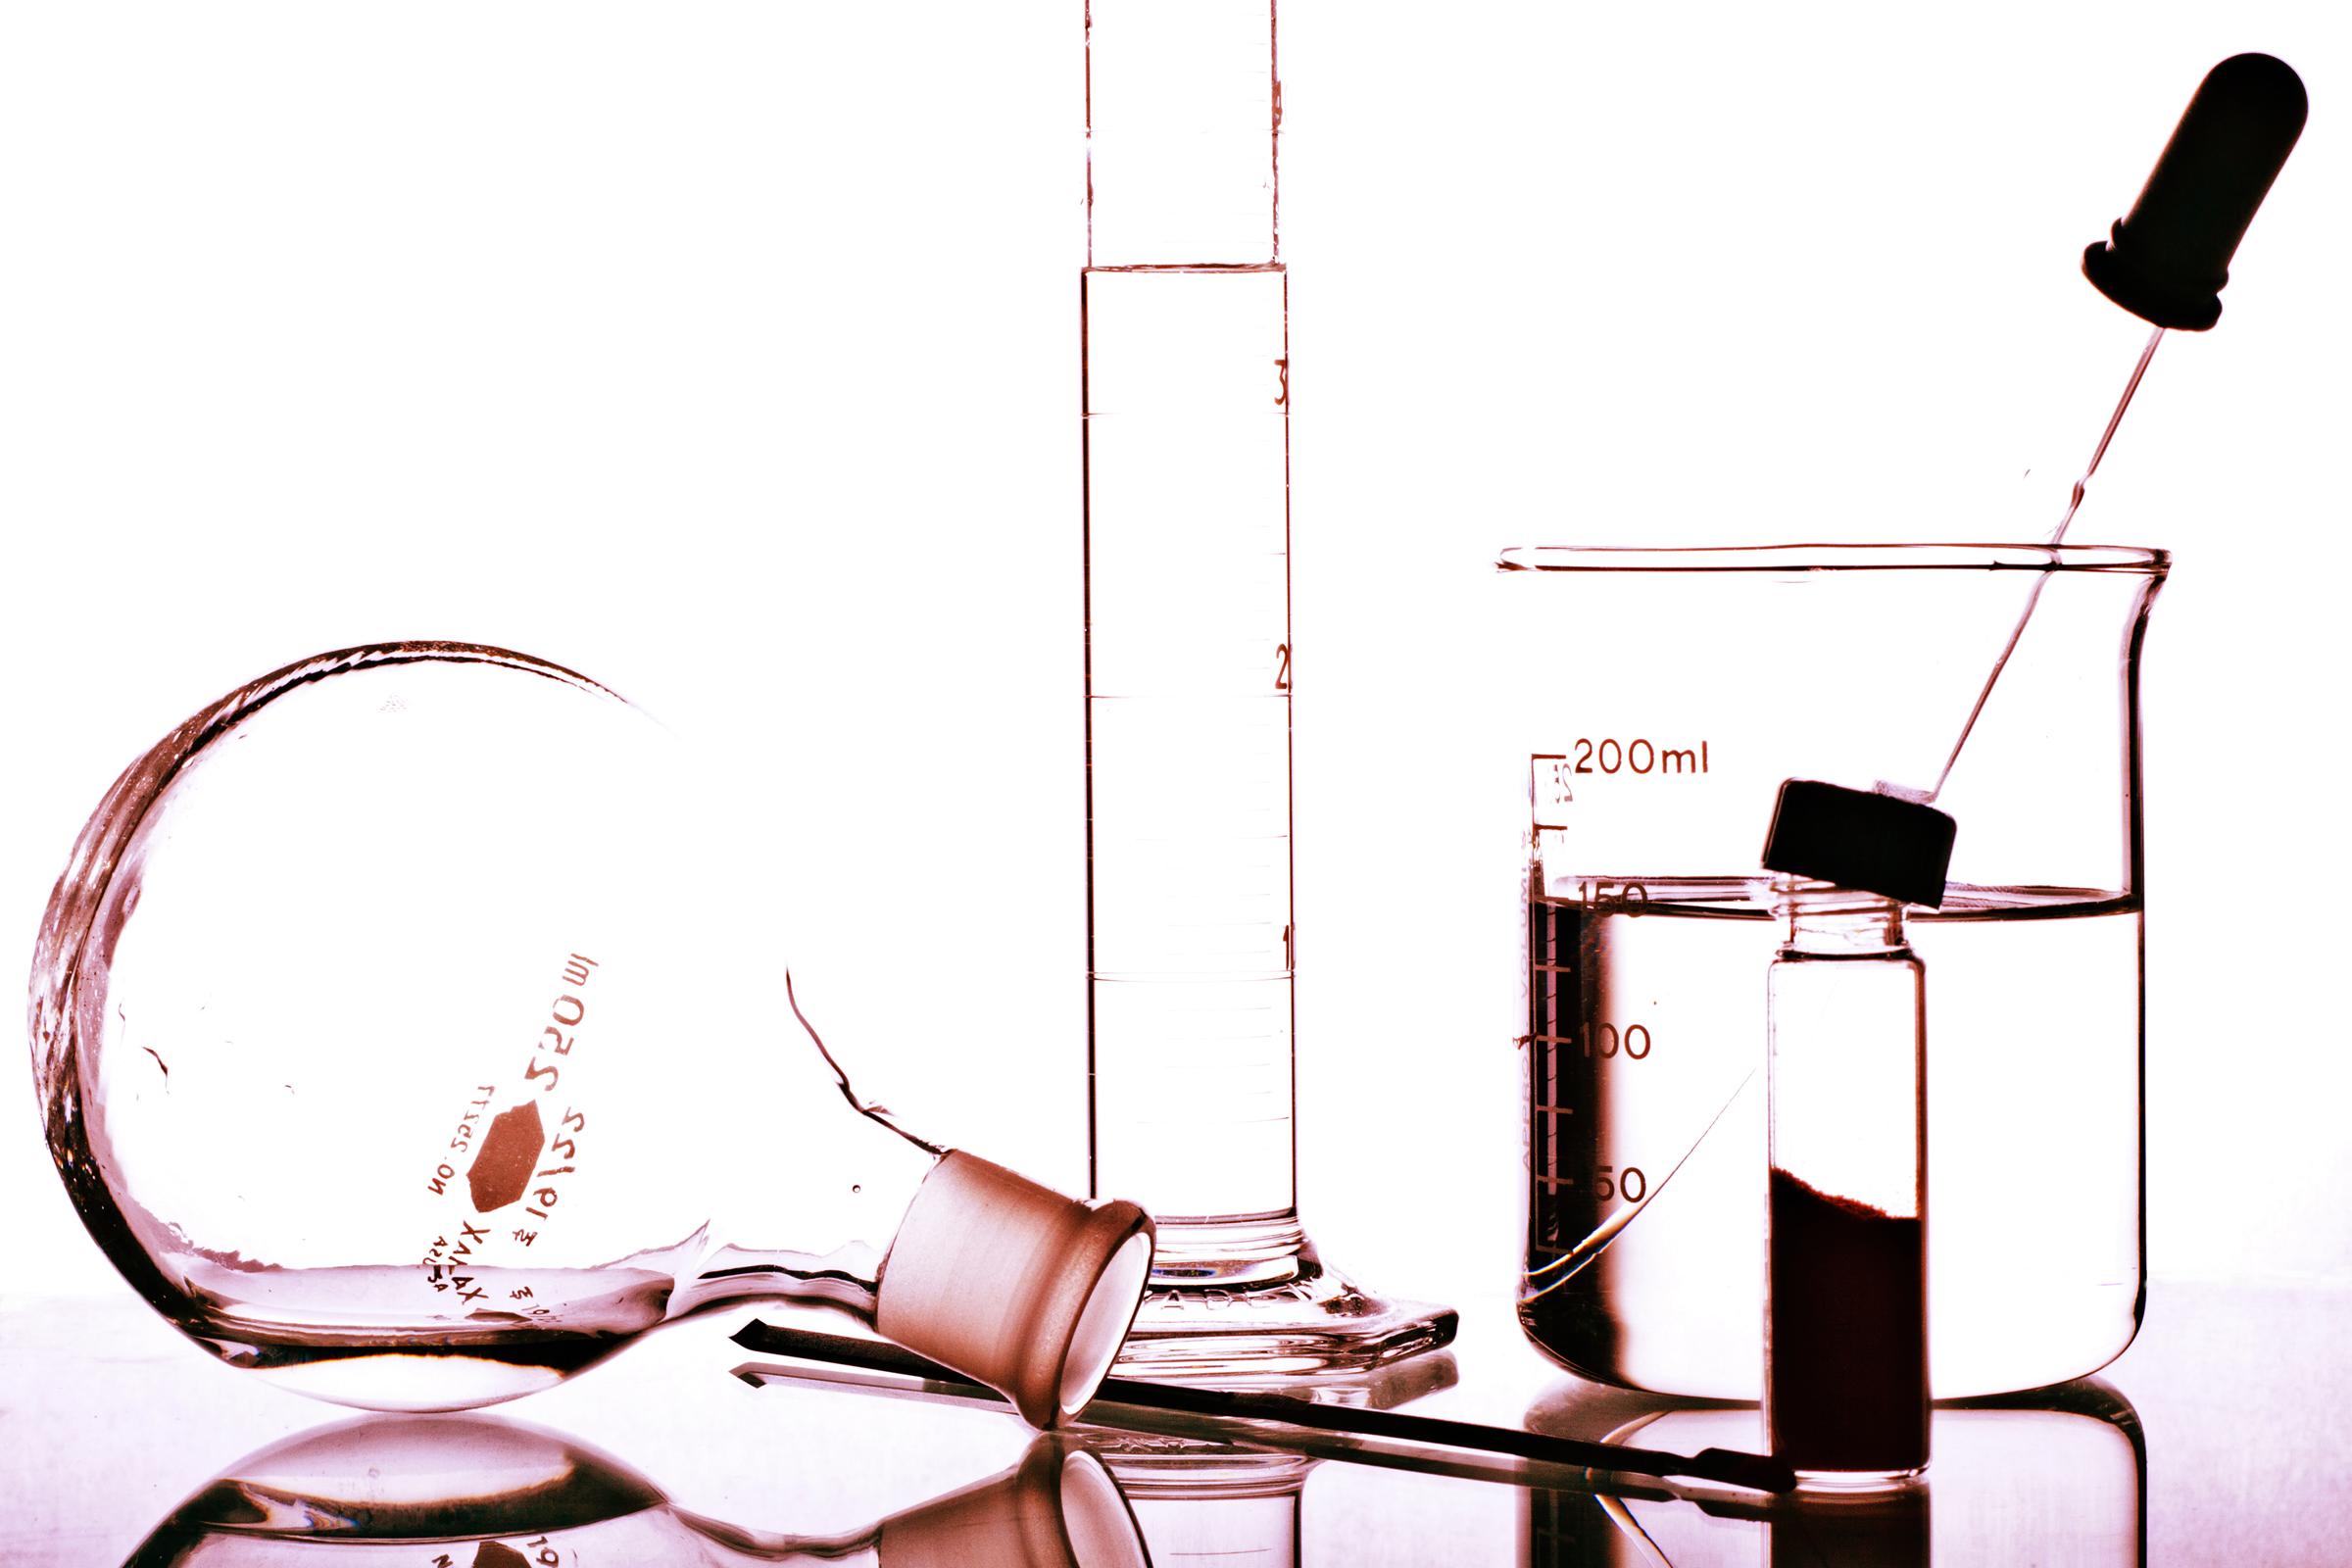 Chemistry, Analysis, Risk, Medical, Medicine, HQ Photo